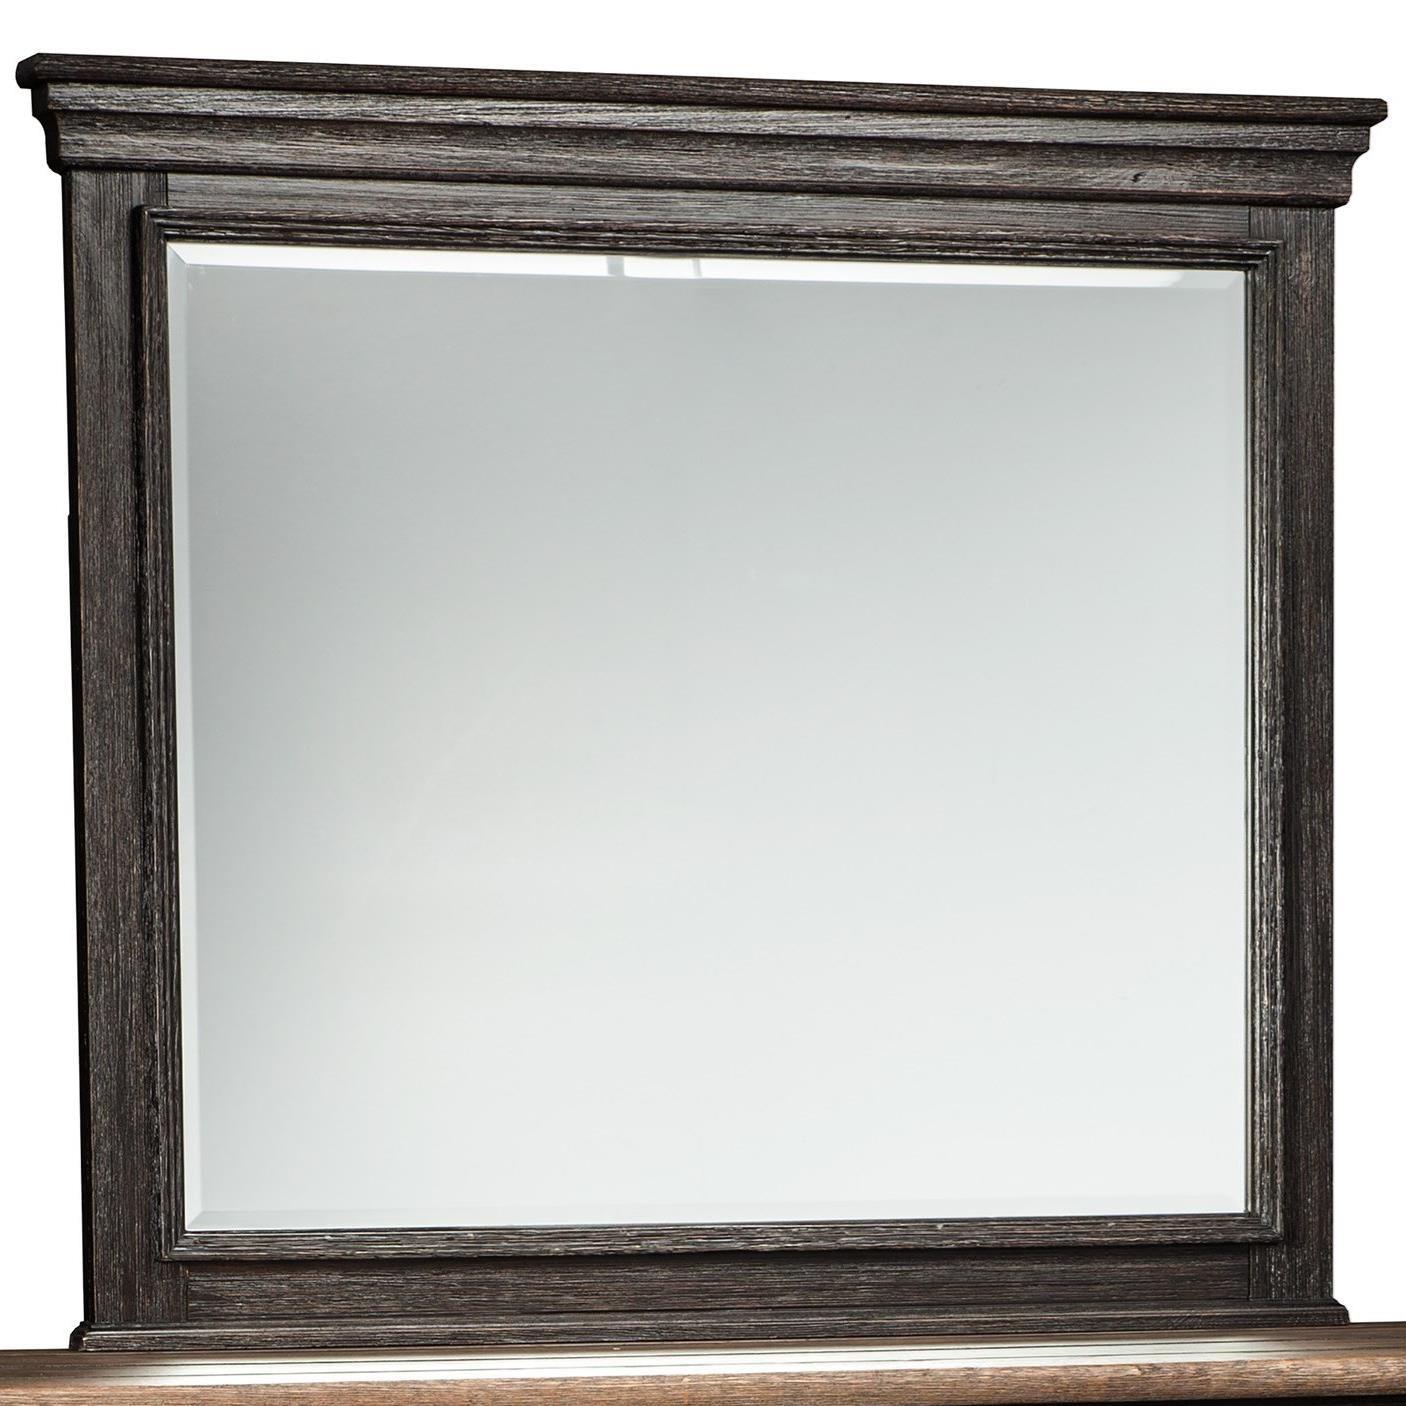 Signature Design by Ashley Tyler Creek Bedroom Mirror - Item Number: B736-36